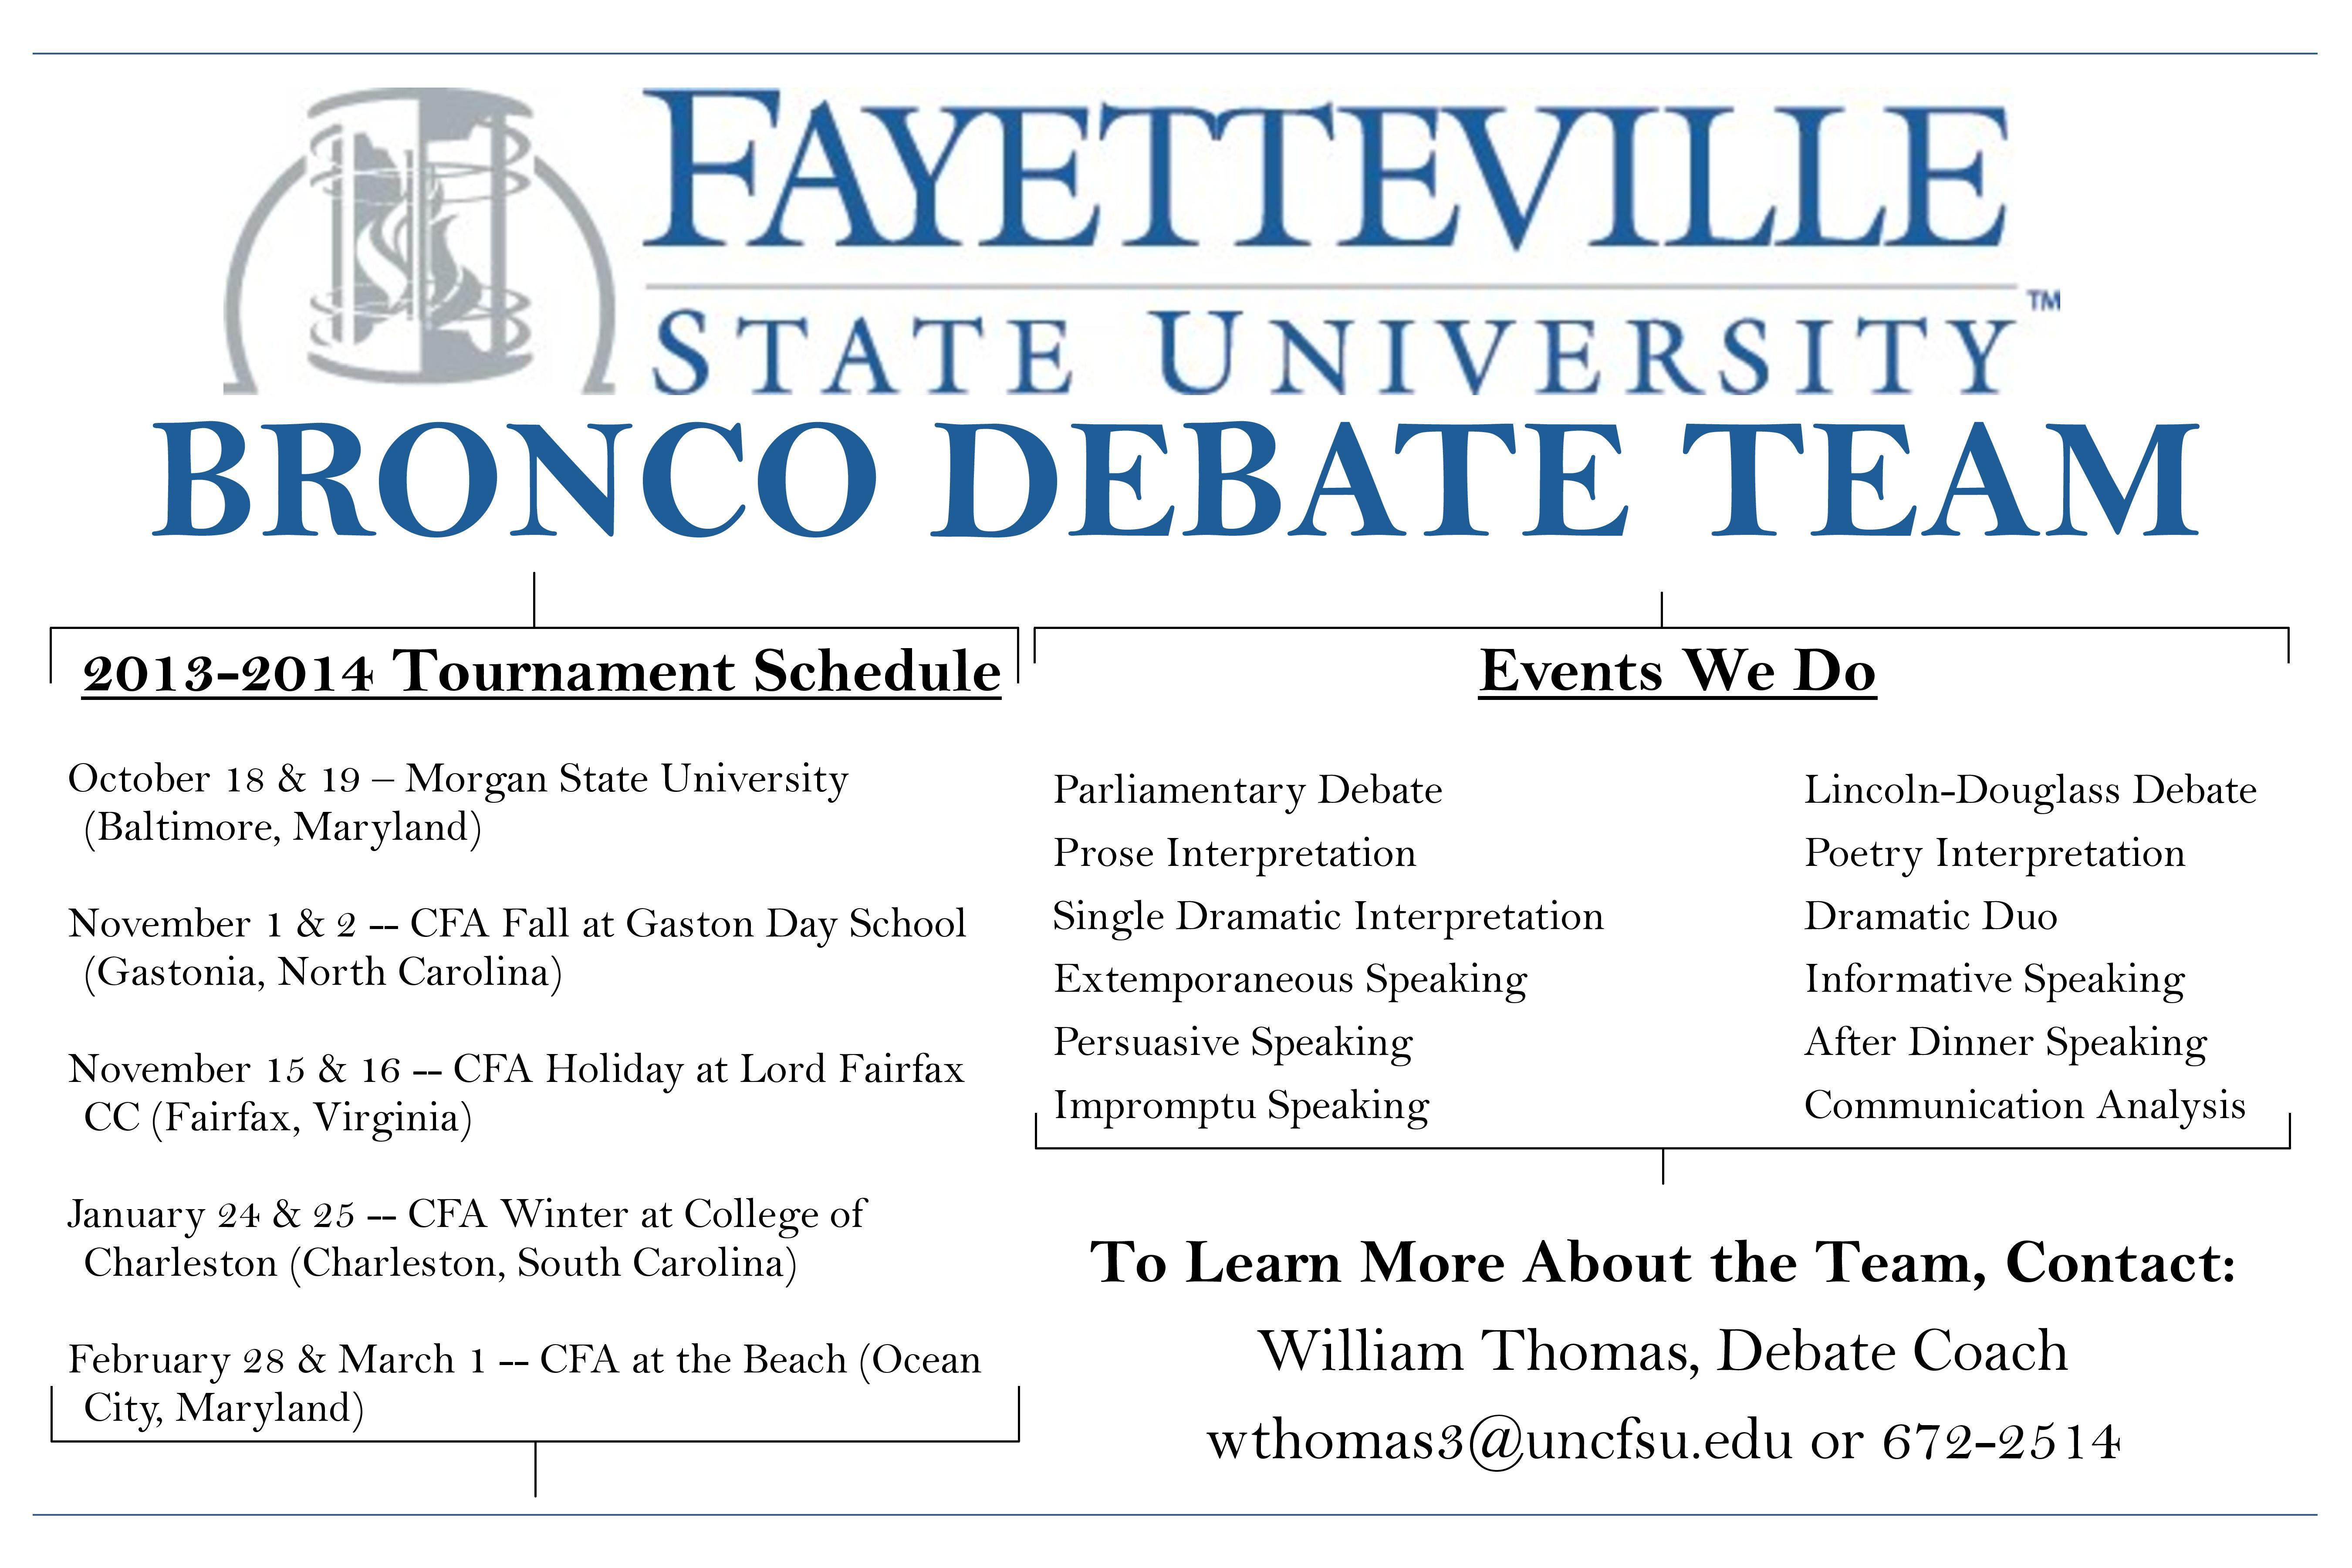 http://www.fsuthevoice.com/wp-content/uploads/2013/11/Debate-Flyer-2013_2014-page-001.jpg